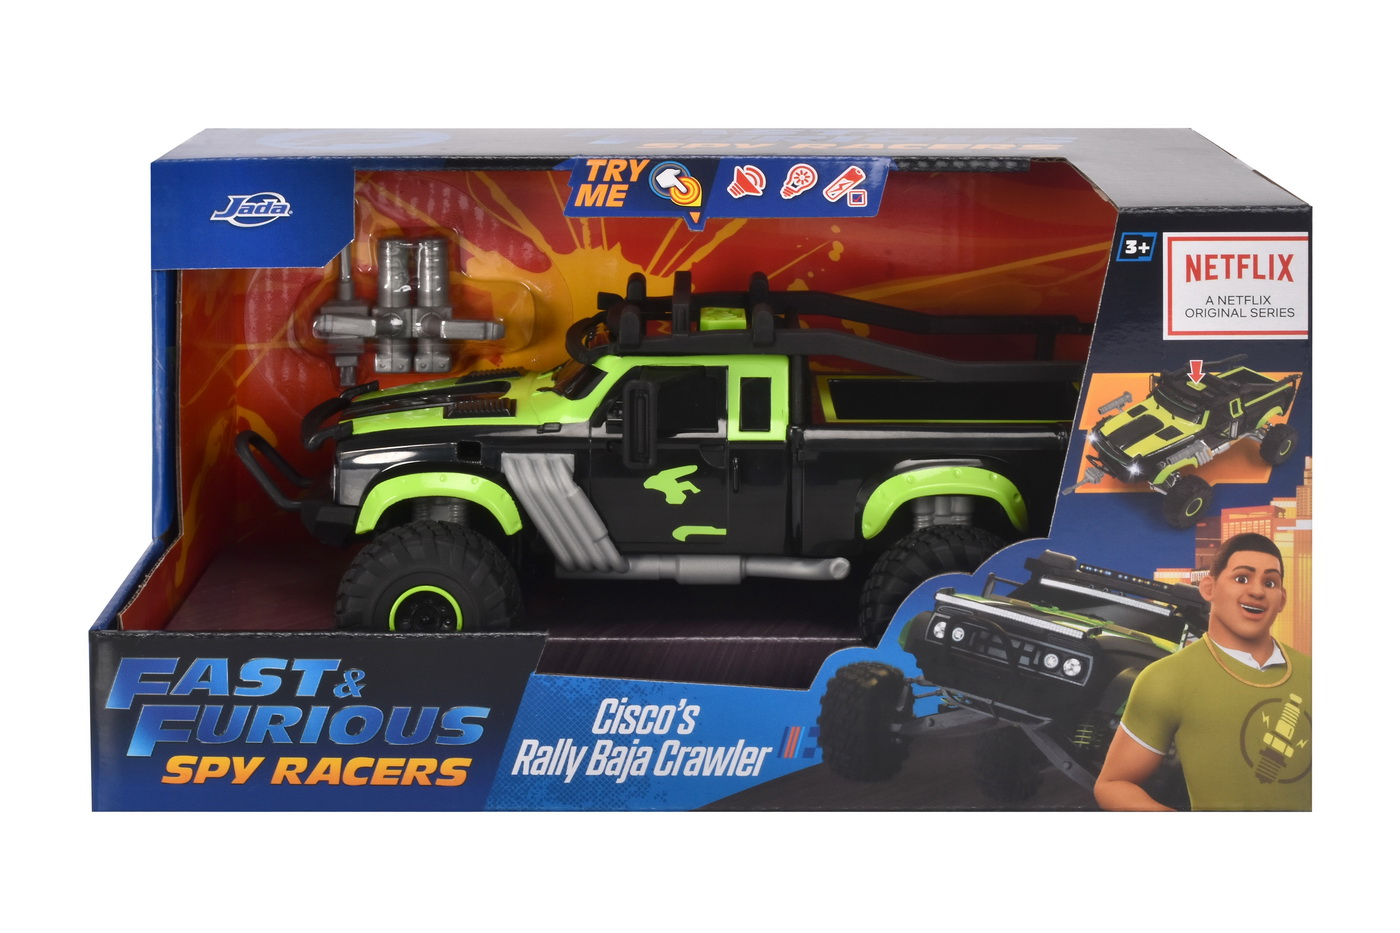 Masinuta Metalica Fast And Furious Spy Racers Cisco's Rally Baja Crawler Scara 1:24